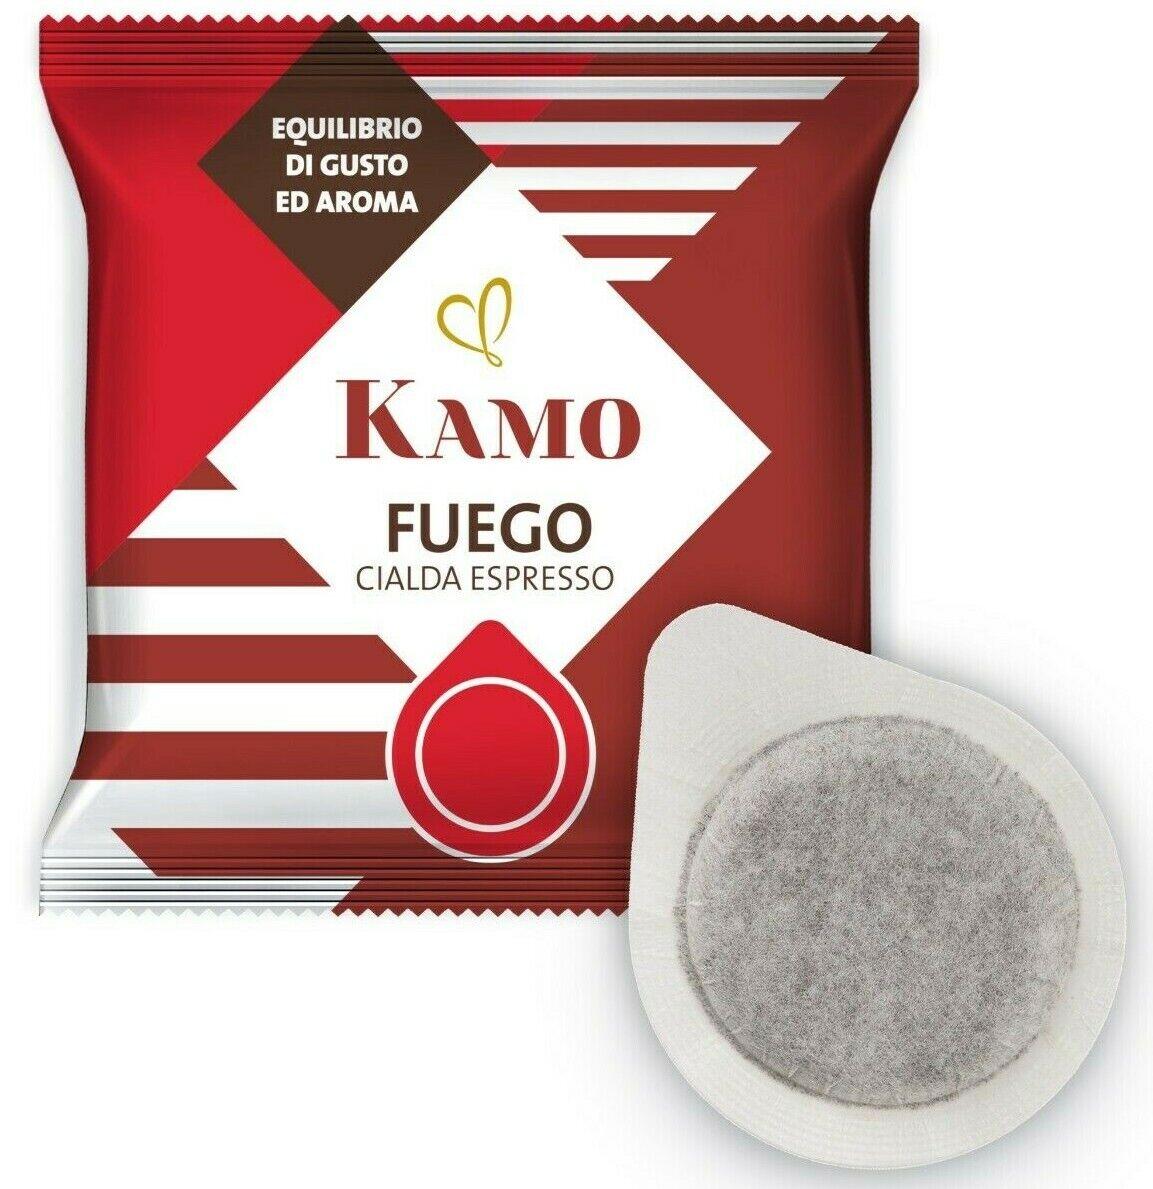 Immagine 1 - 150 Cialde Caffè KAMO Filtro carta ESE 44mm Miscela Fuego